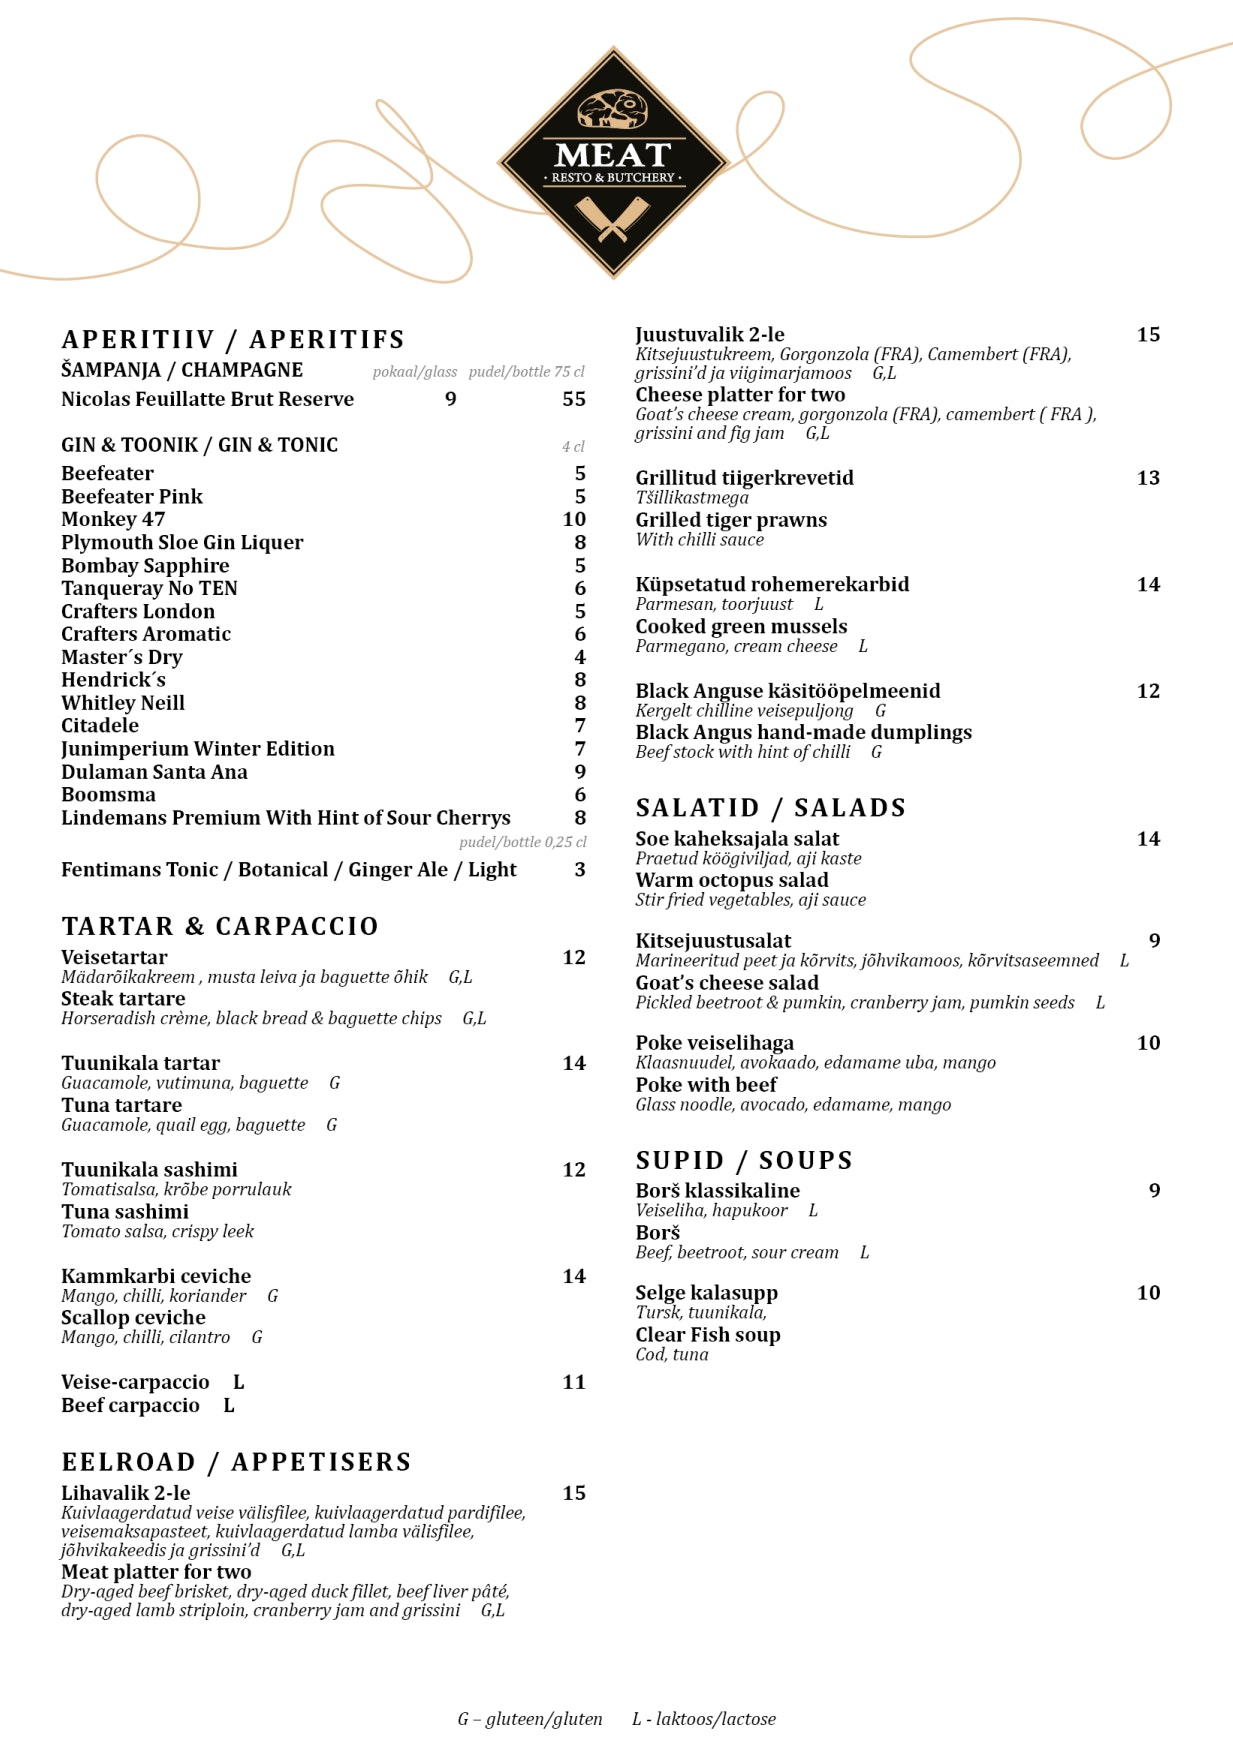 MEAT Resto & Butchery menu 1/5